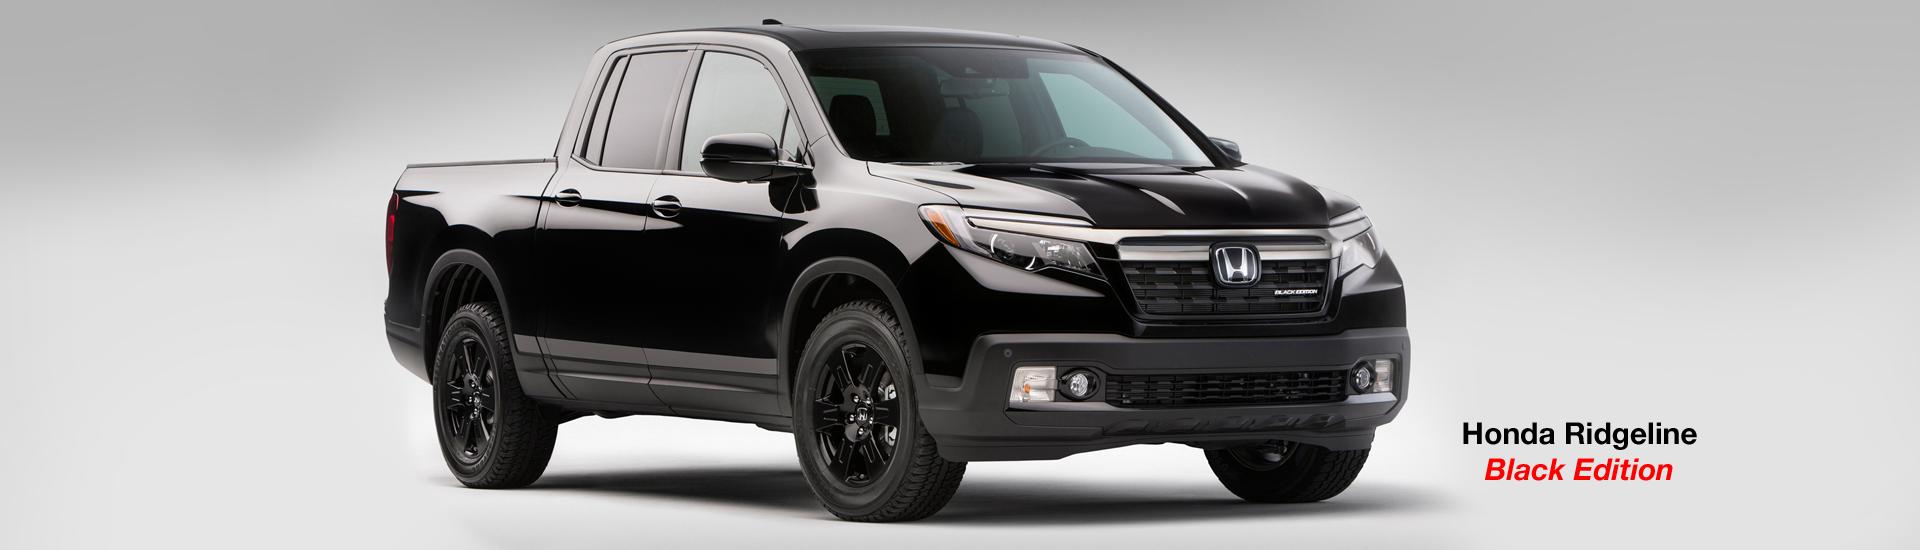 Honda Ridgeline Truck black